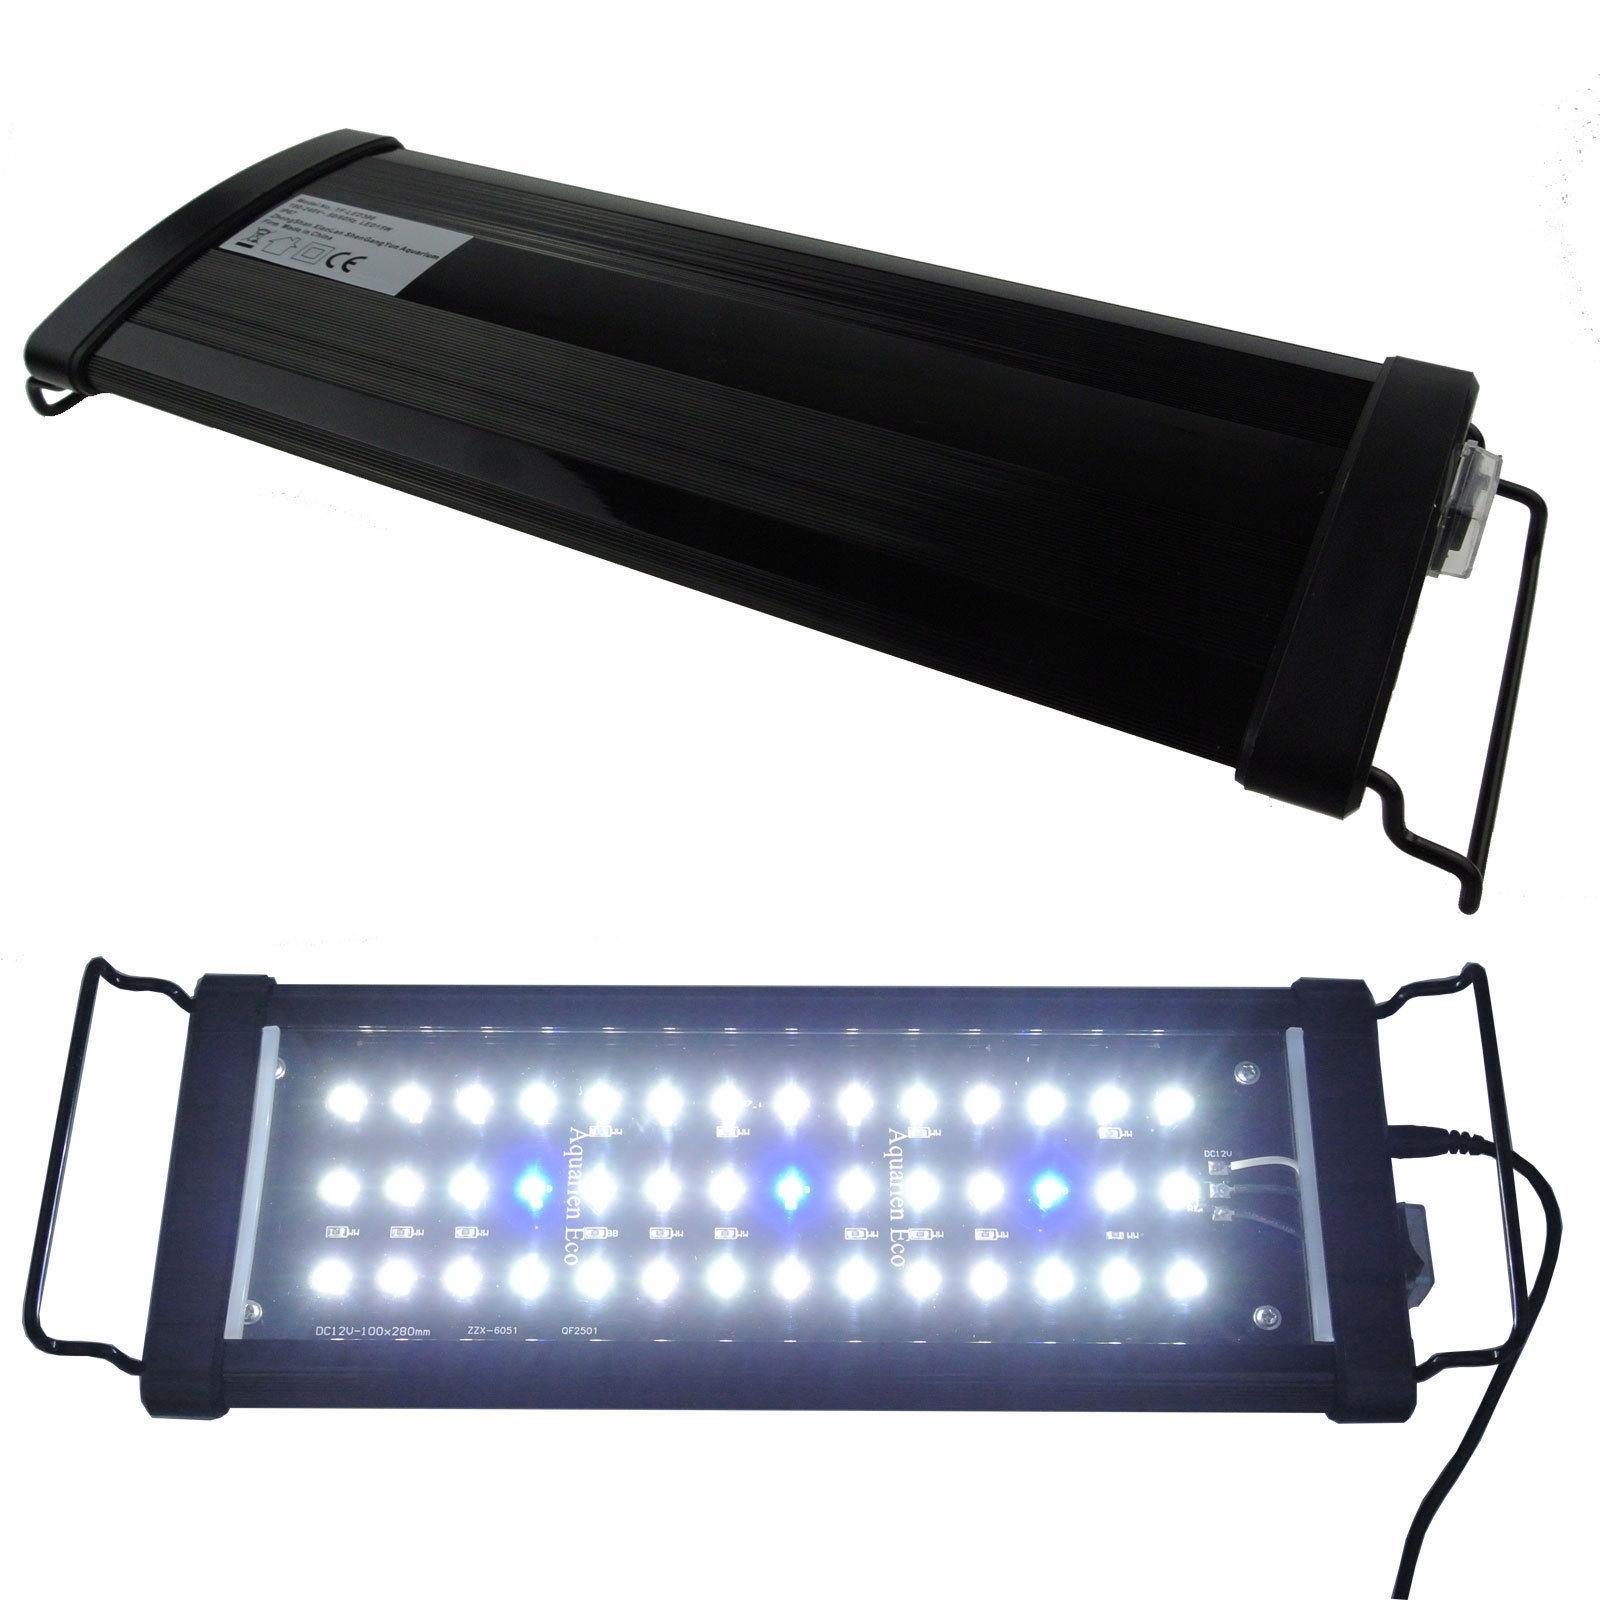 Lampa Led Do Akwarium Belka Oświetlenie 40 65cm 7686362505